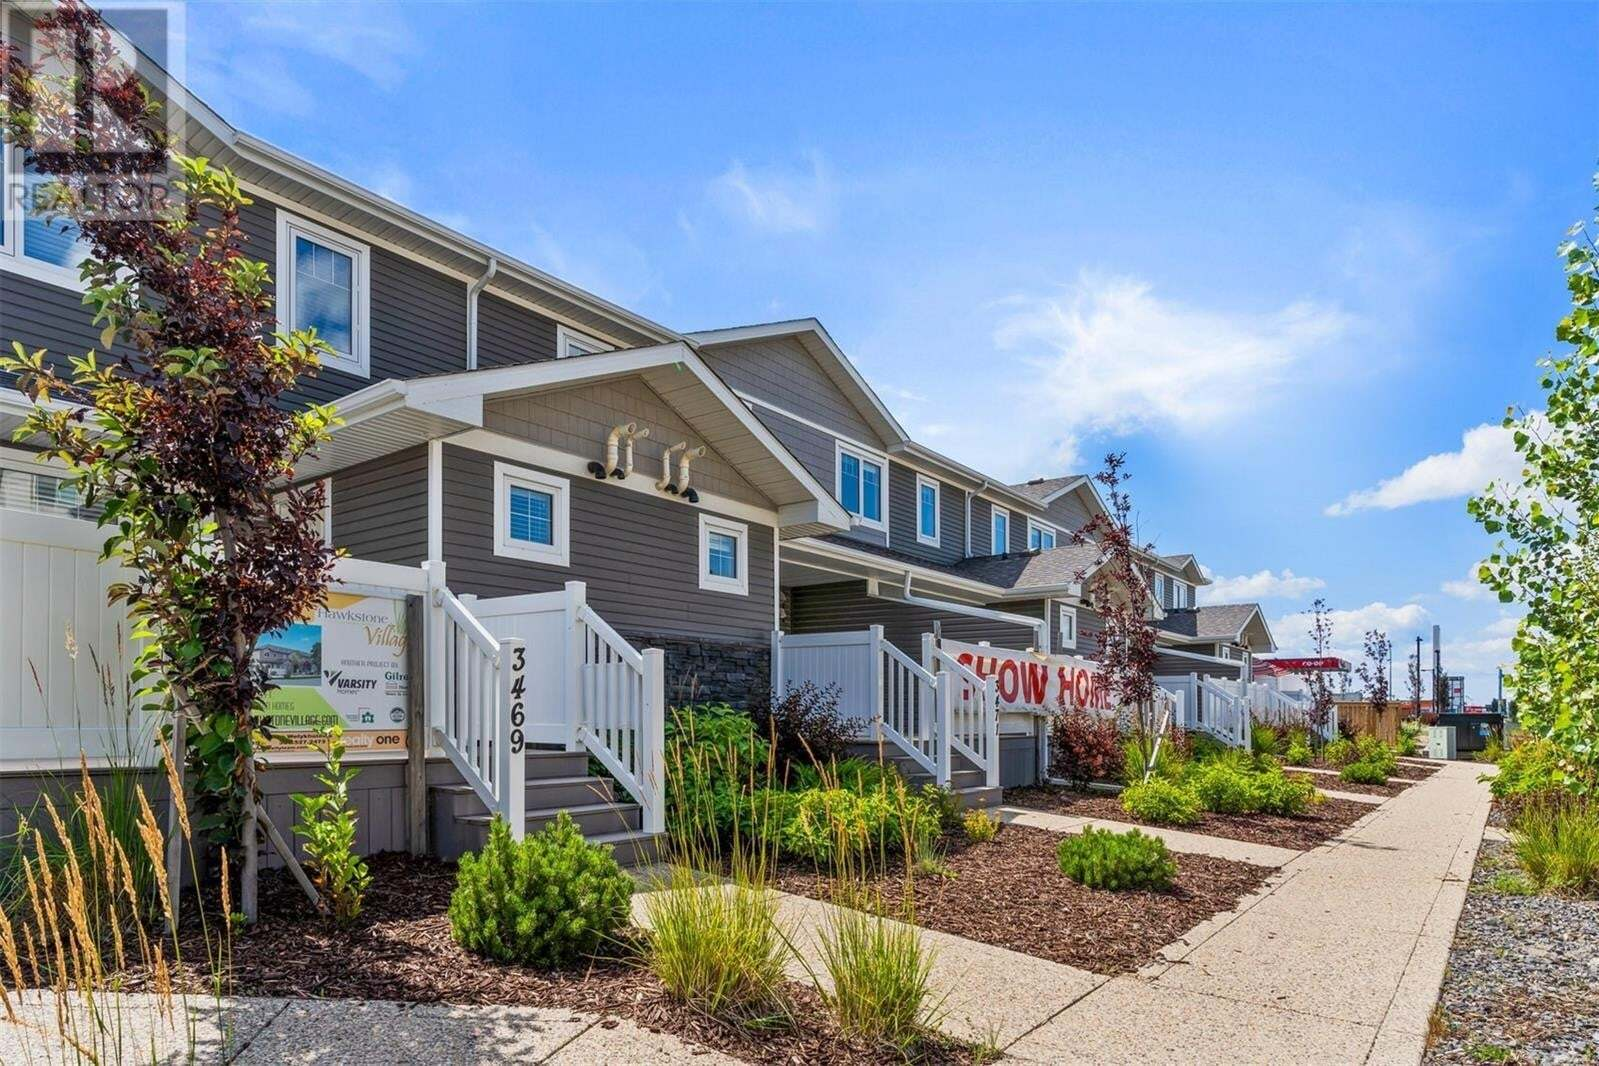 Townhouse for sale at 3473 Elgaard Dr Regina Saskatchewan - MLS: SK821522